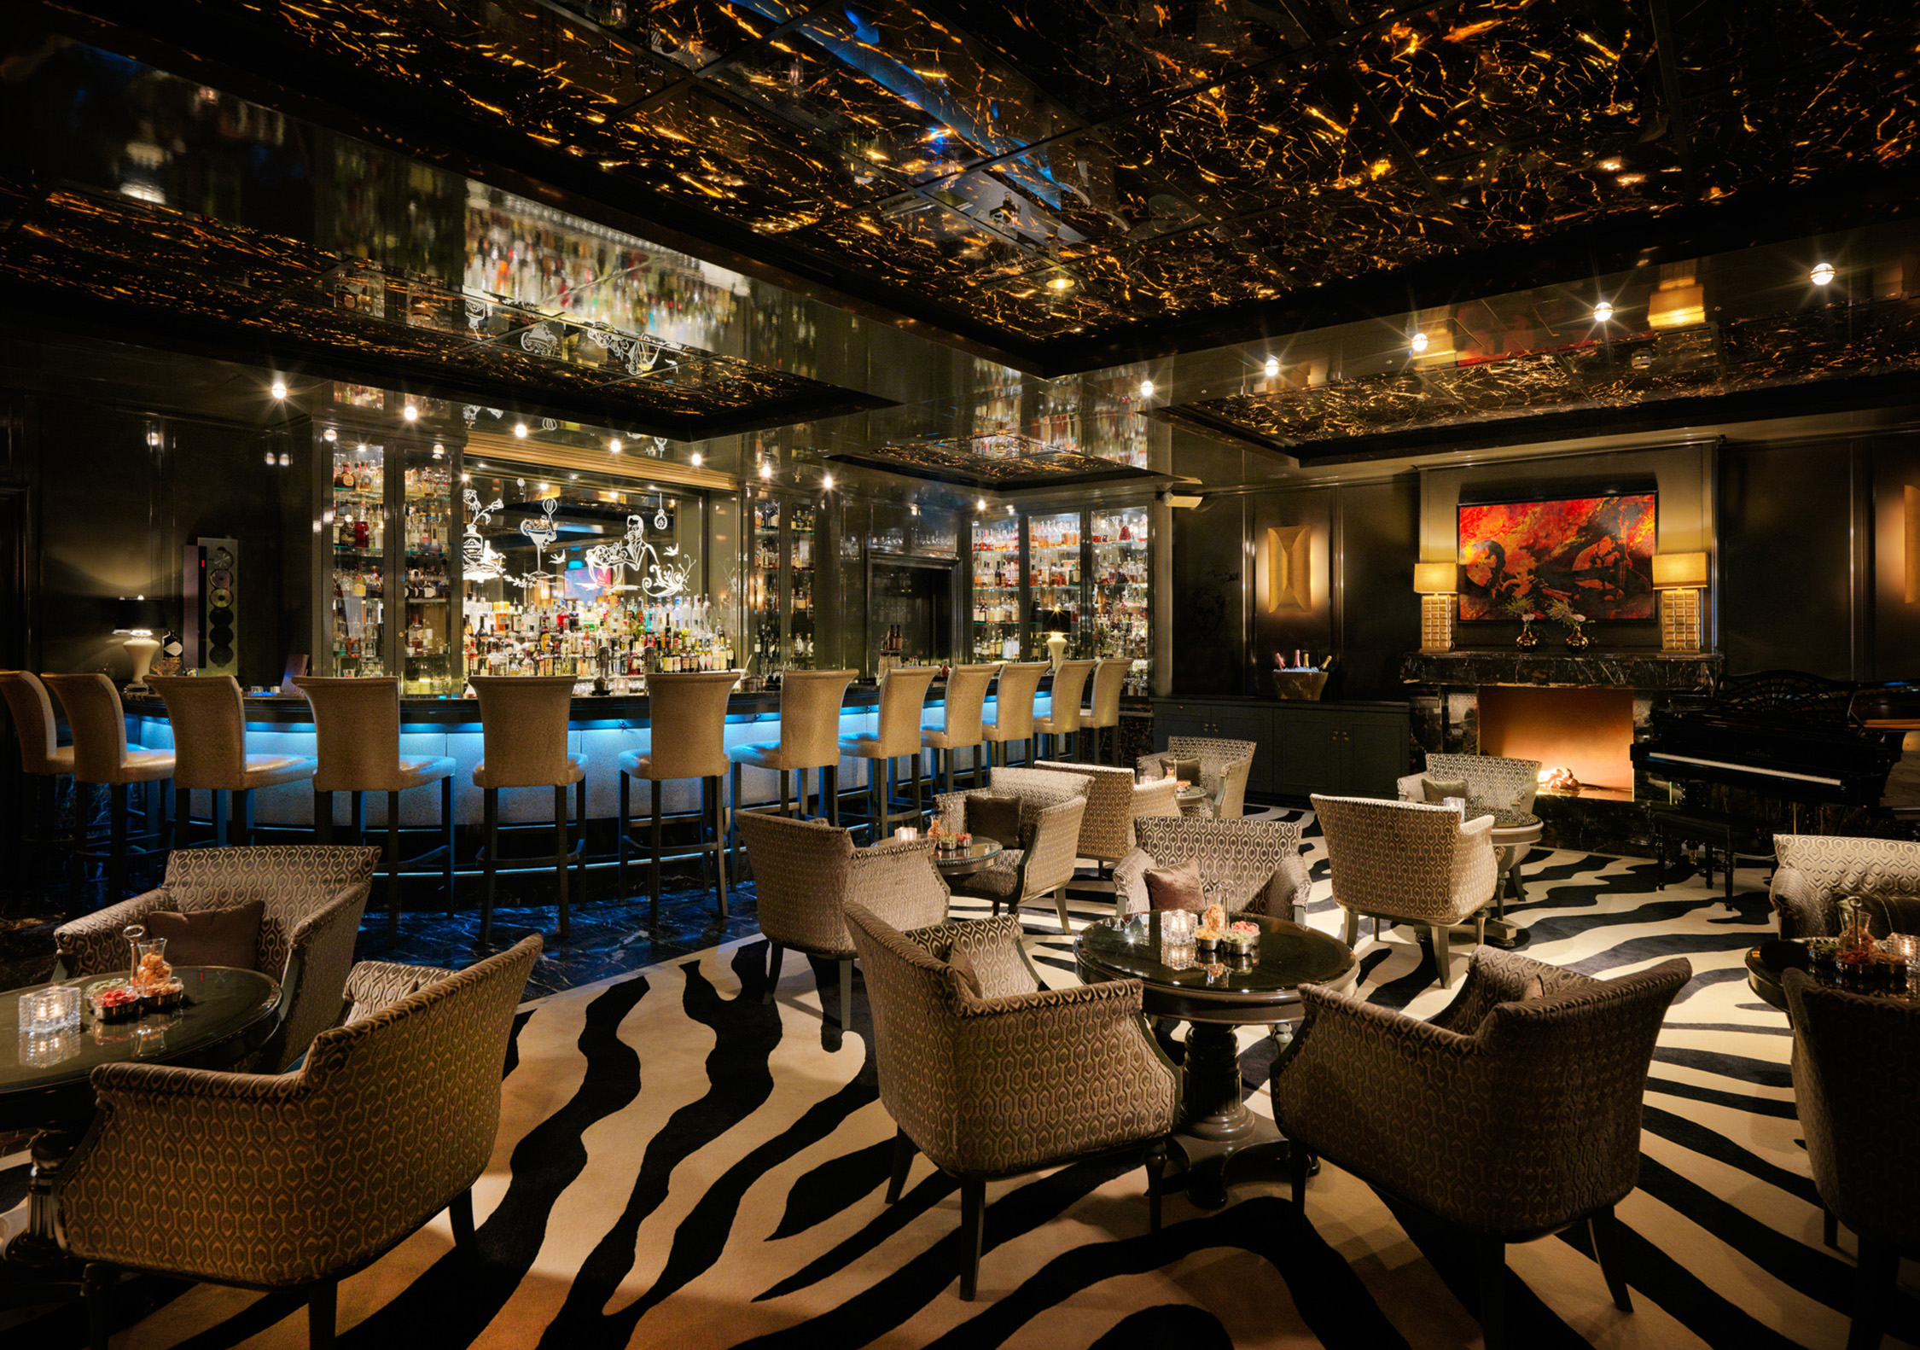 capella-bar-2016-Duesseldorf-Breidenbacher-Hof-hotel-venice